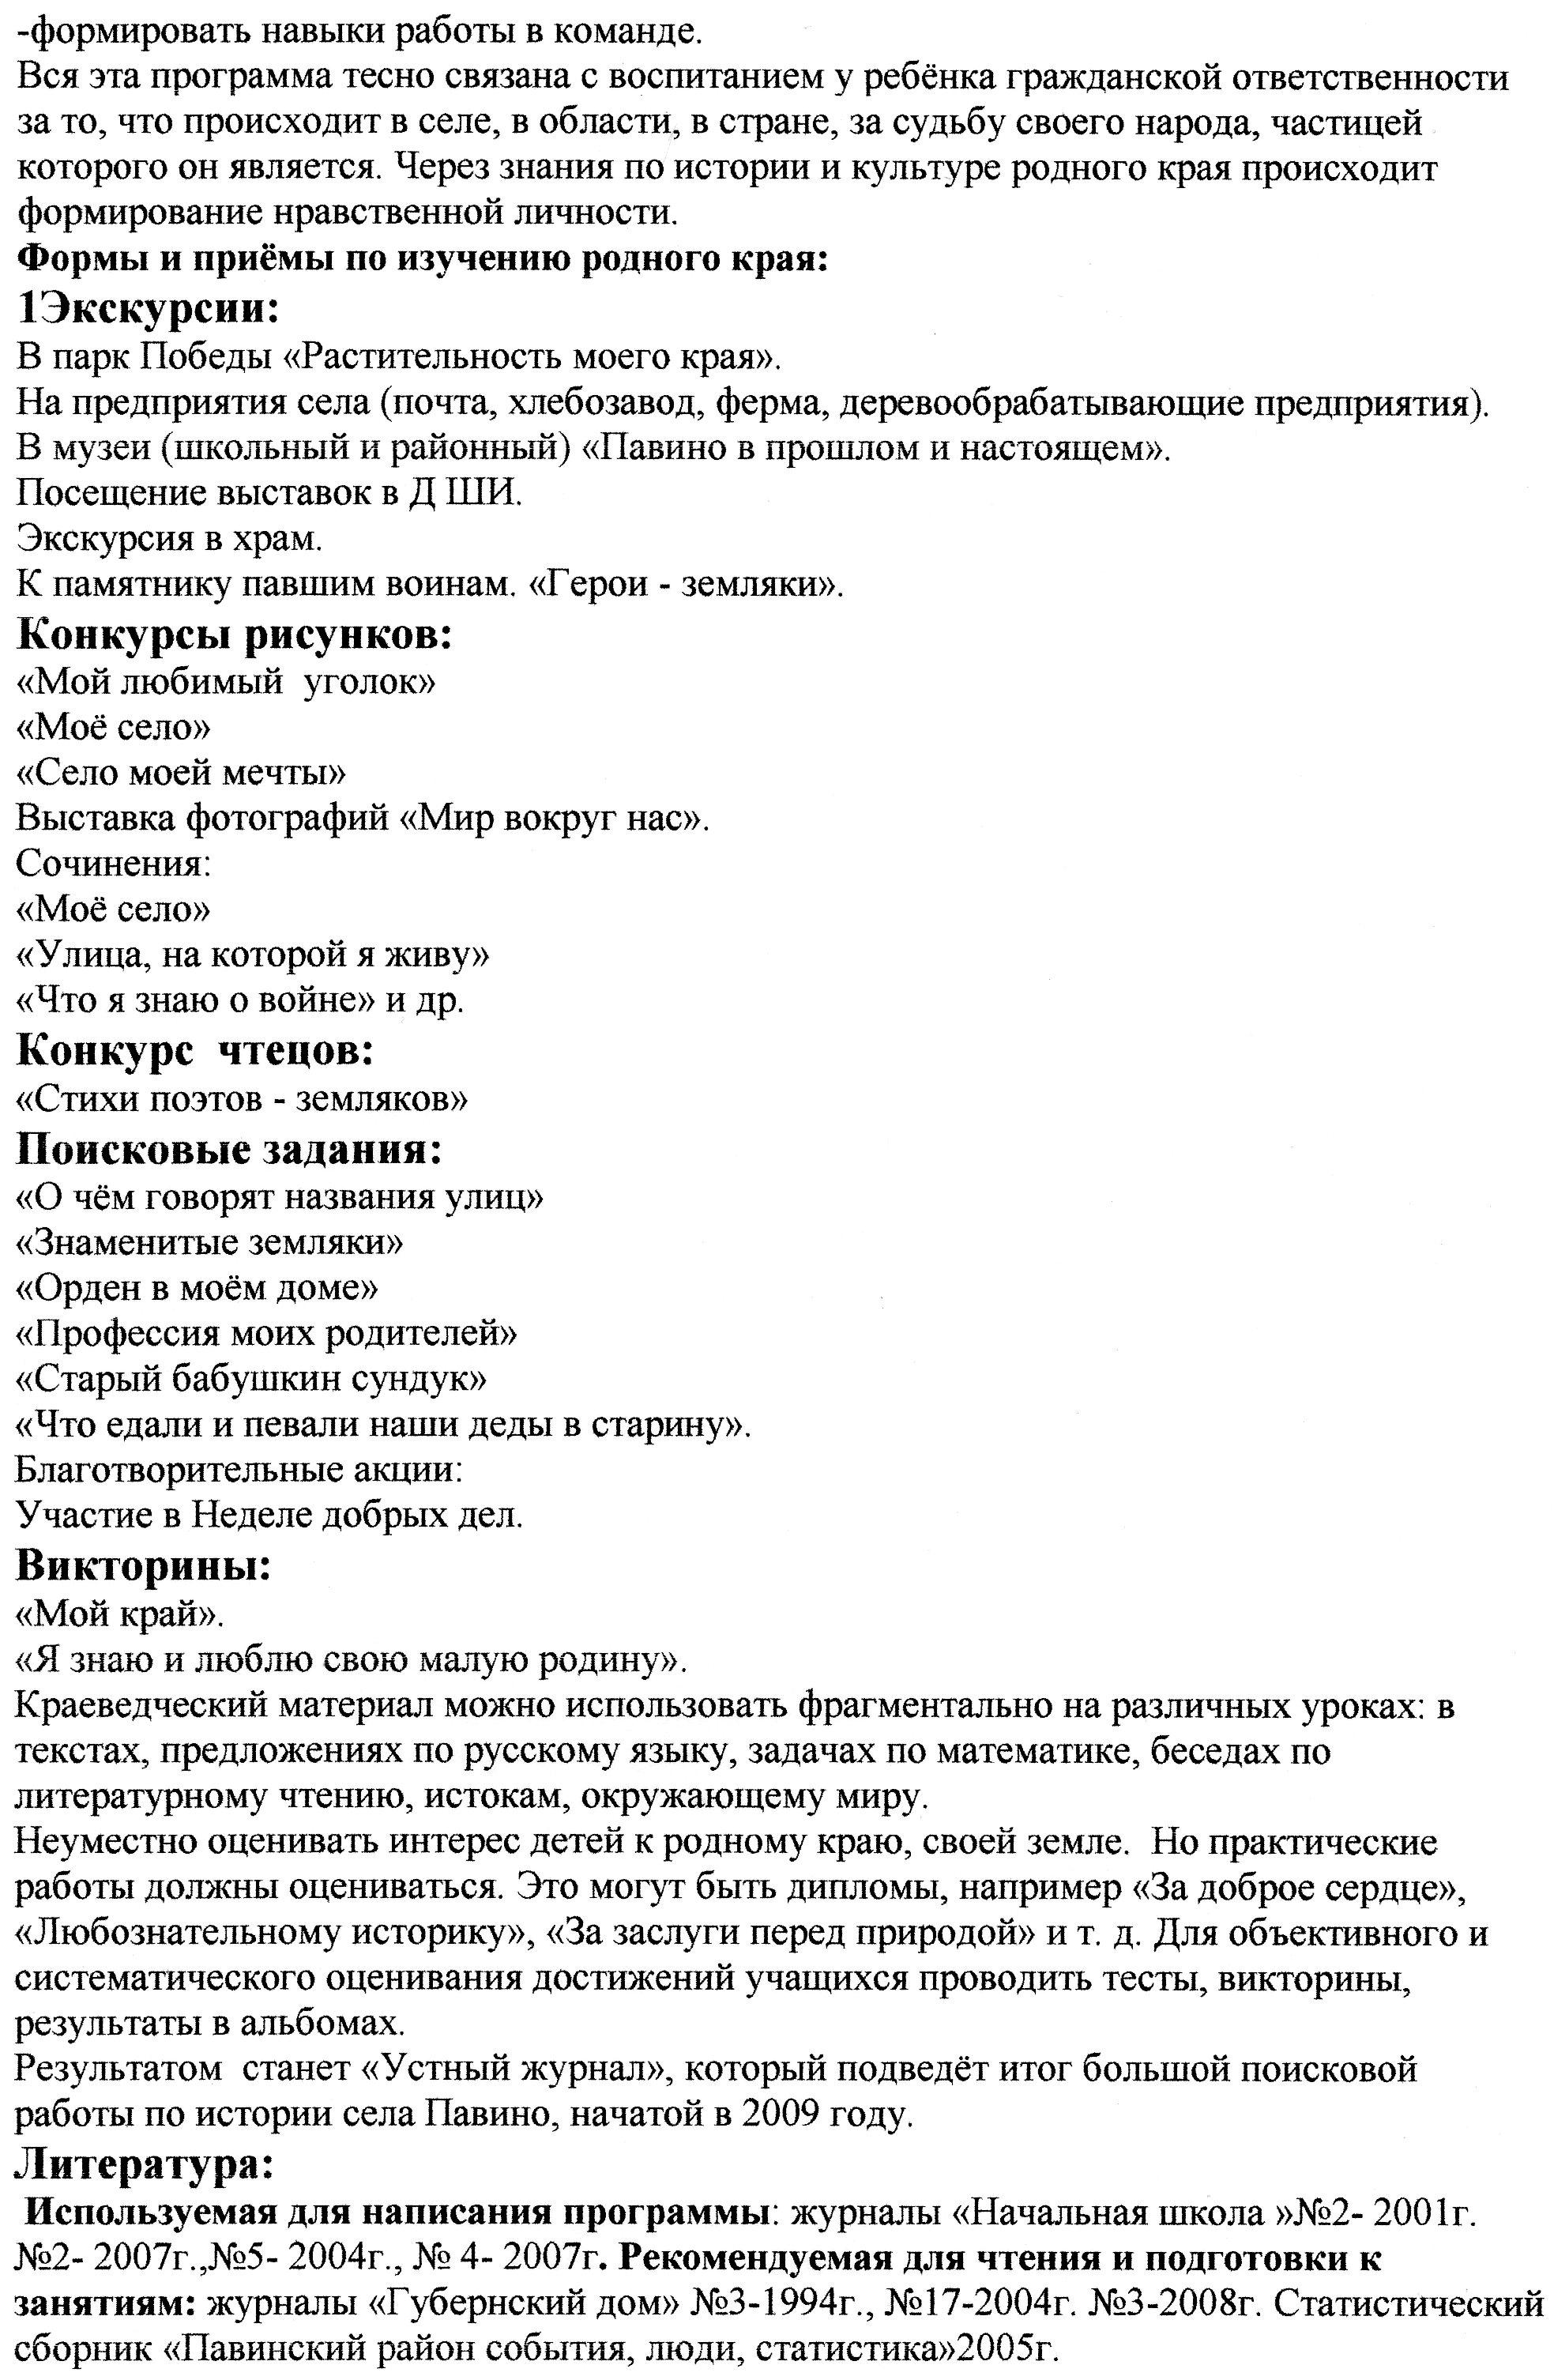 C:\Users\Владимир\Desktop\Новая папка (2)\img003.jpg